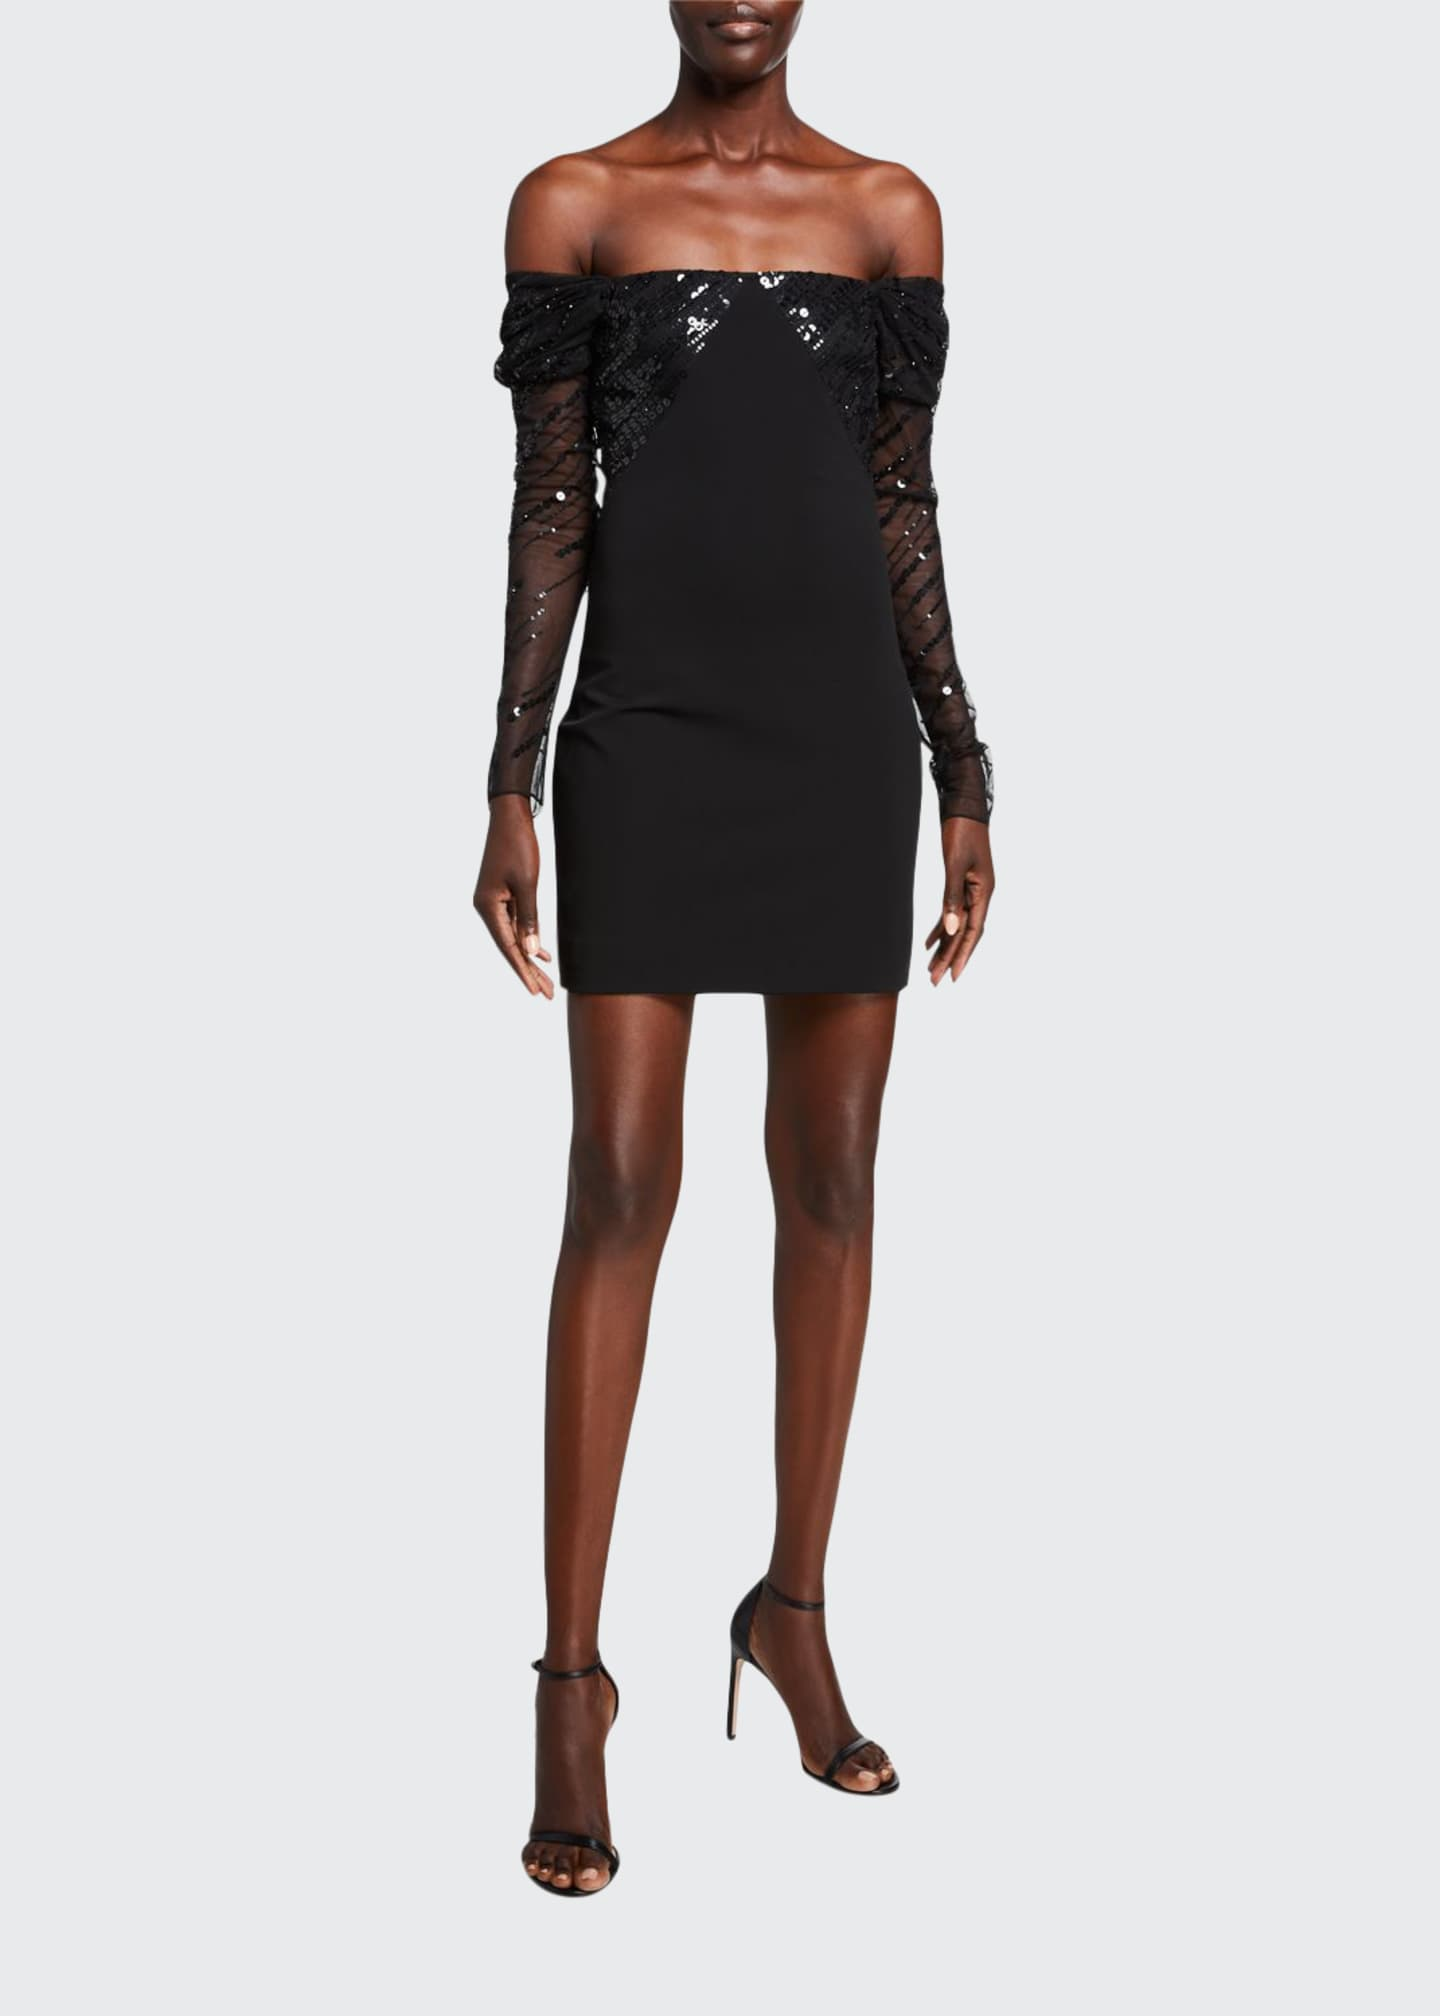 CUSHNIE Off-the-Shoulder Sequined Mini Dress